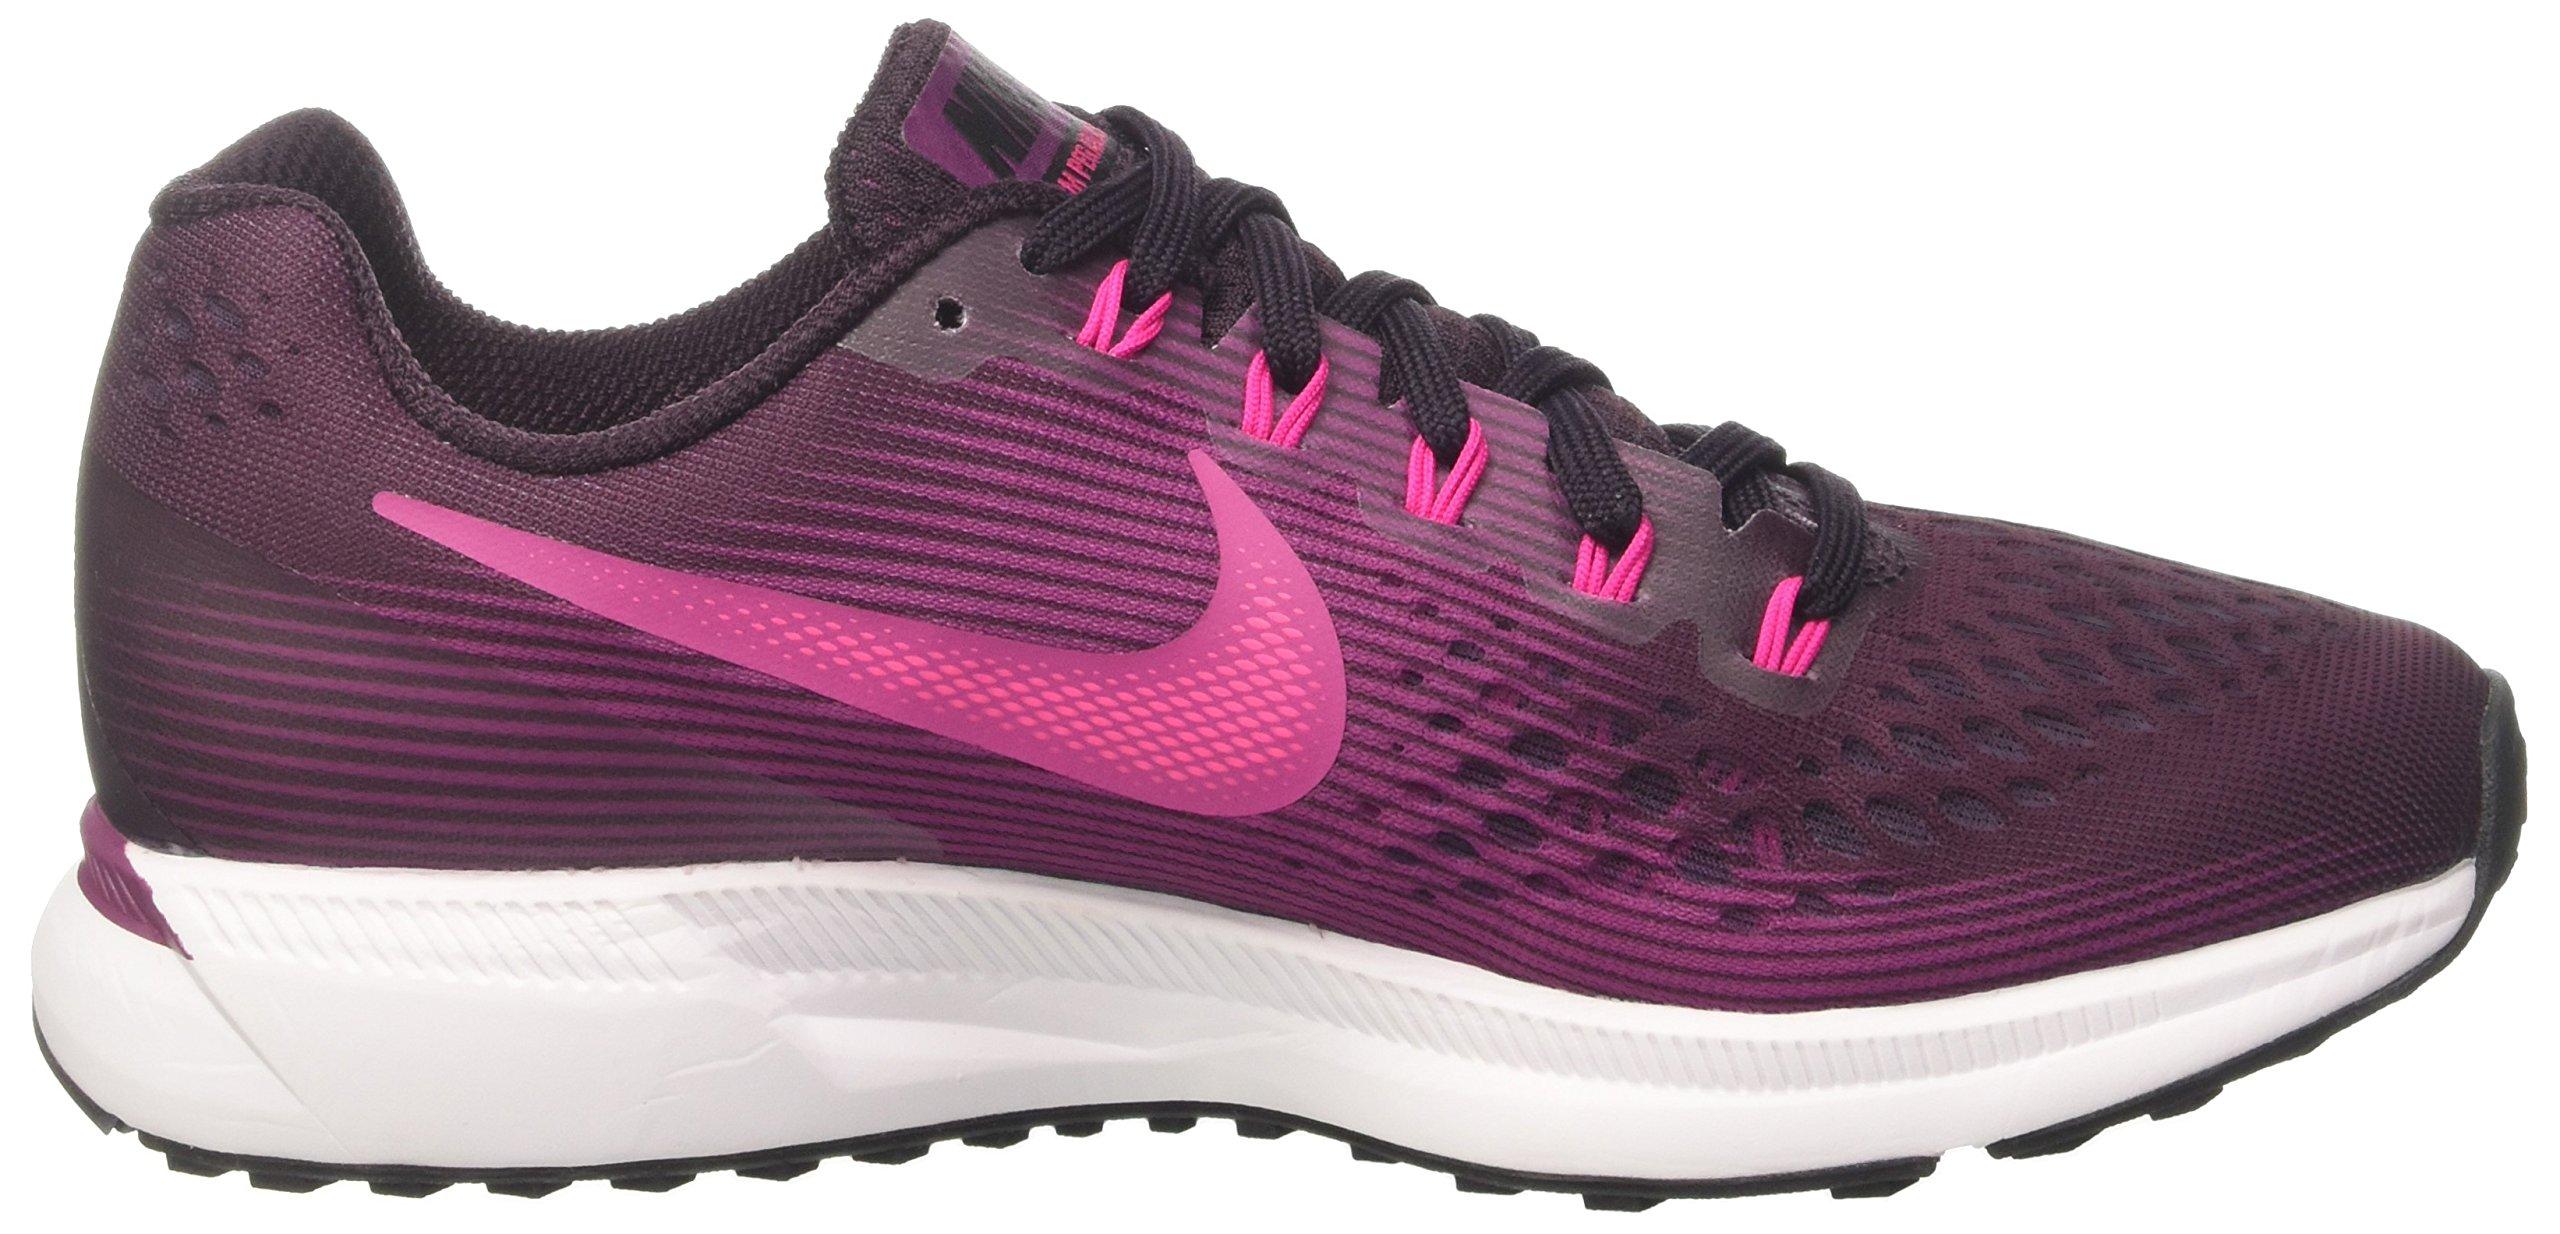 NIKE Women's Air Zoom Pegasus 34 Port Wine/Deadly Pink Running Shoe 7 Women US by NIKE (Image #6)